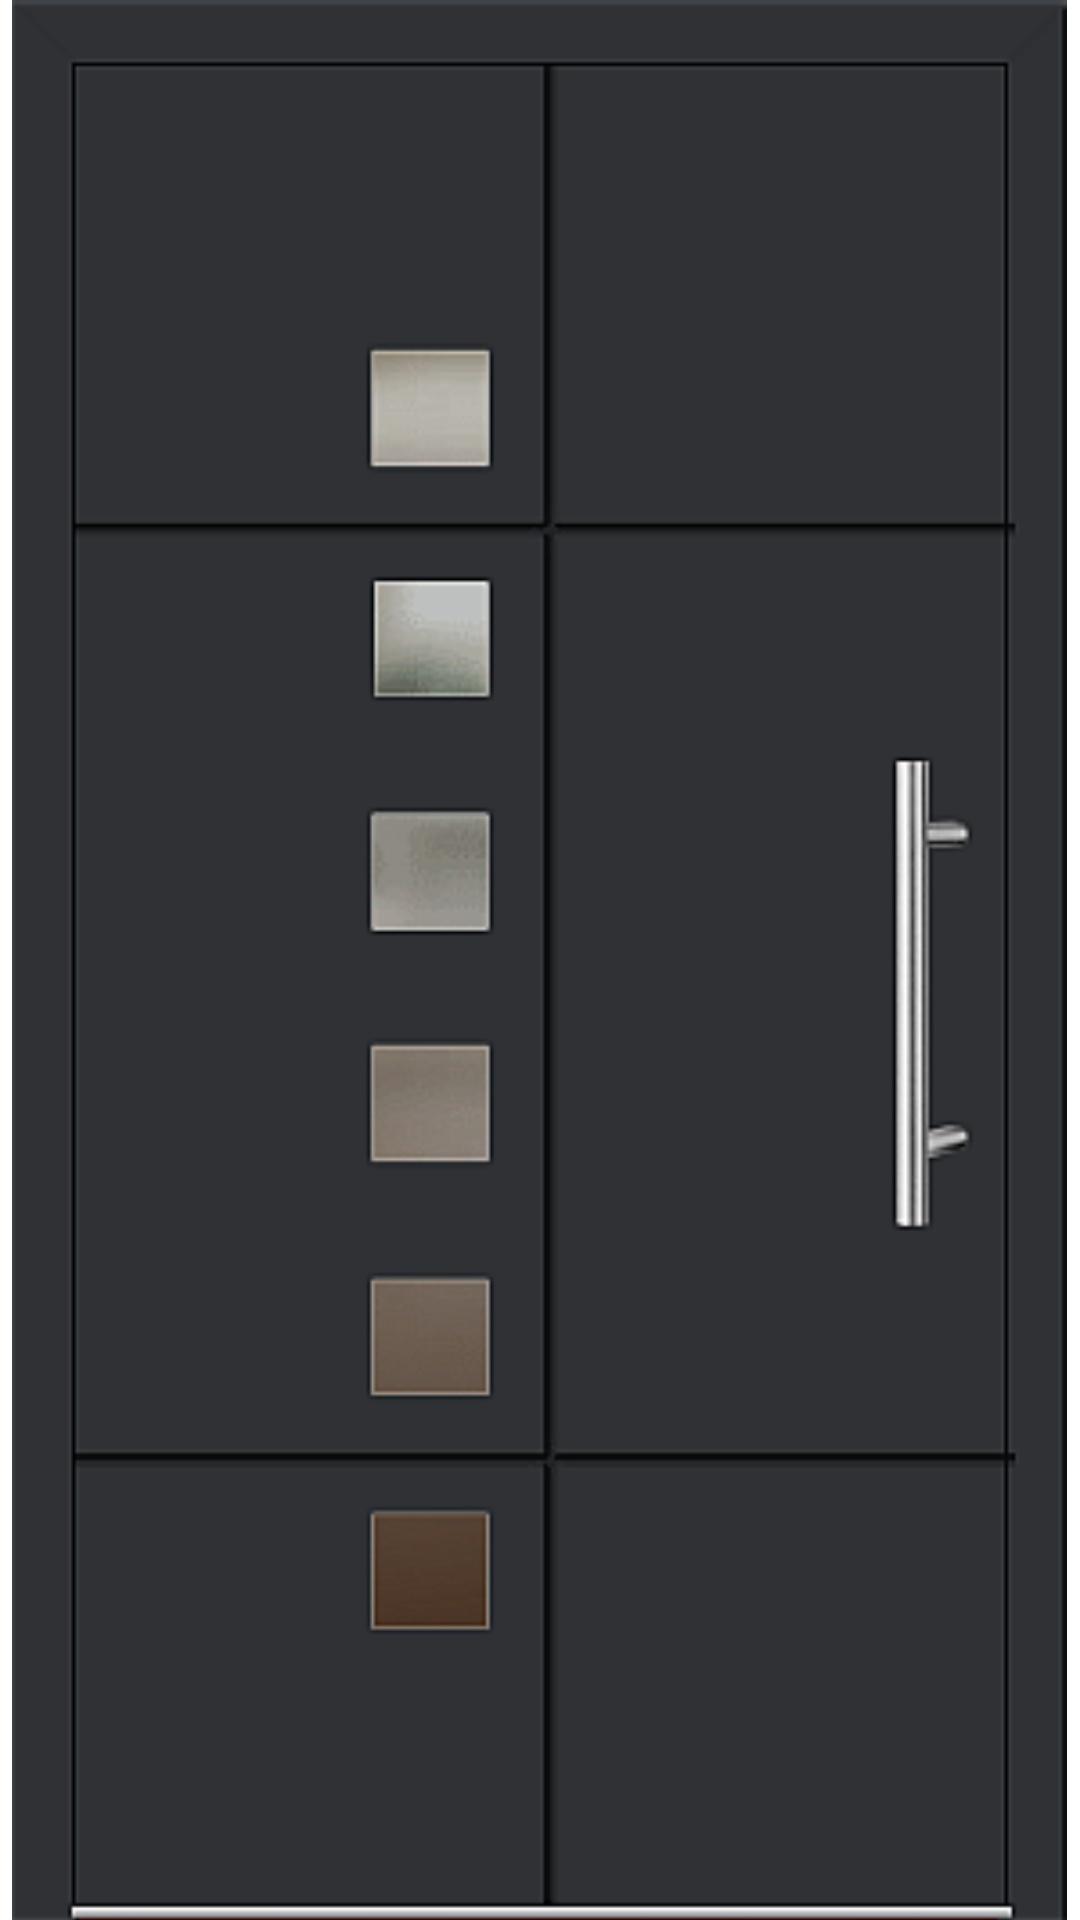 Aluminium Haustür Modell 6534-52 schwarz